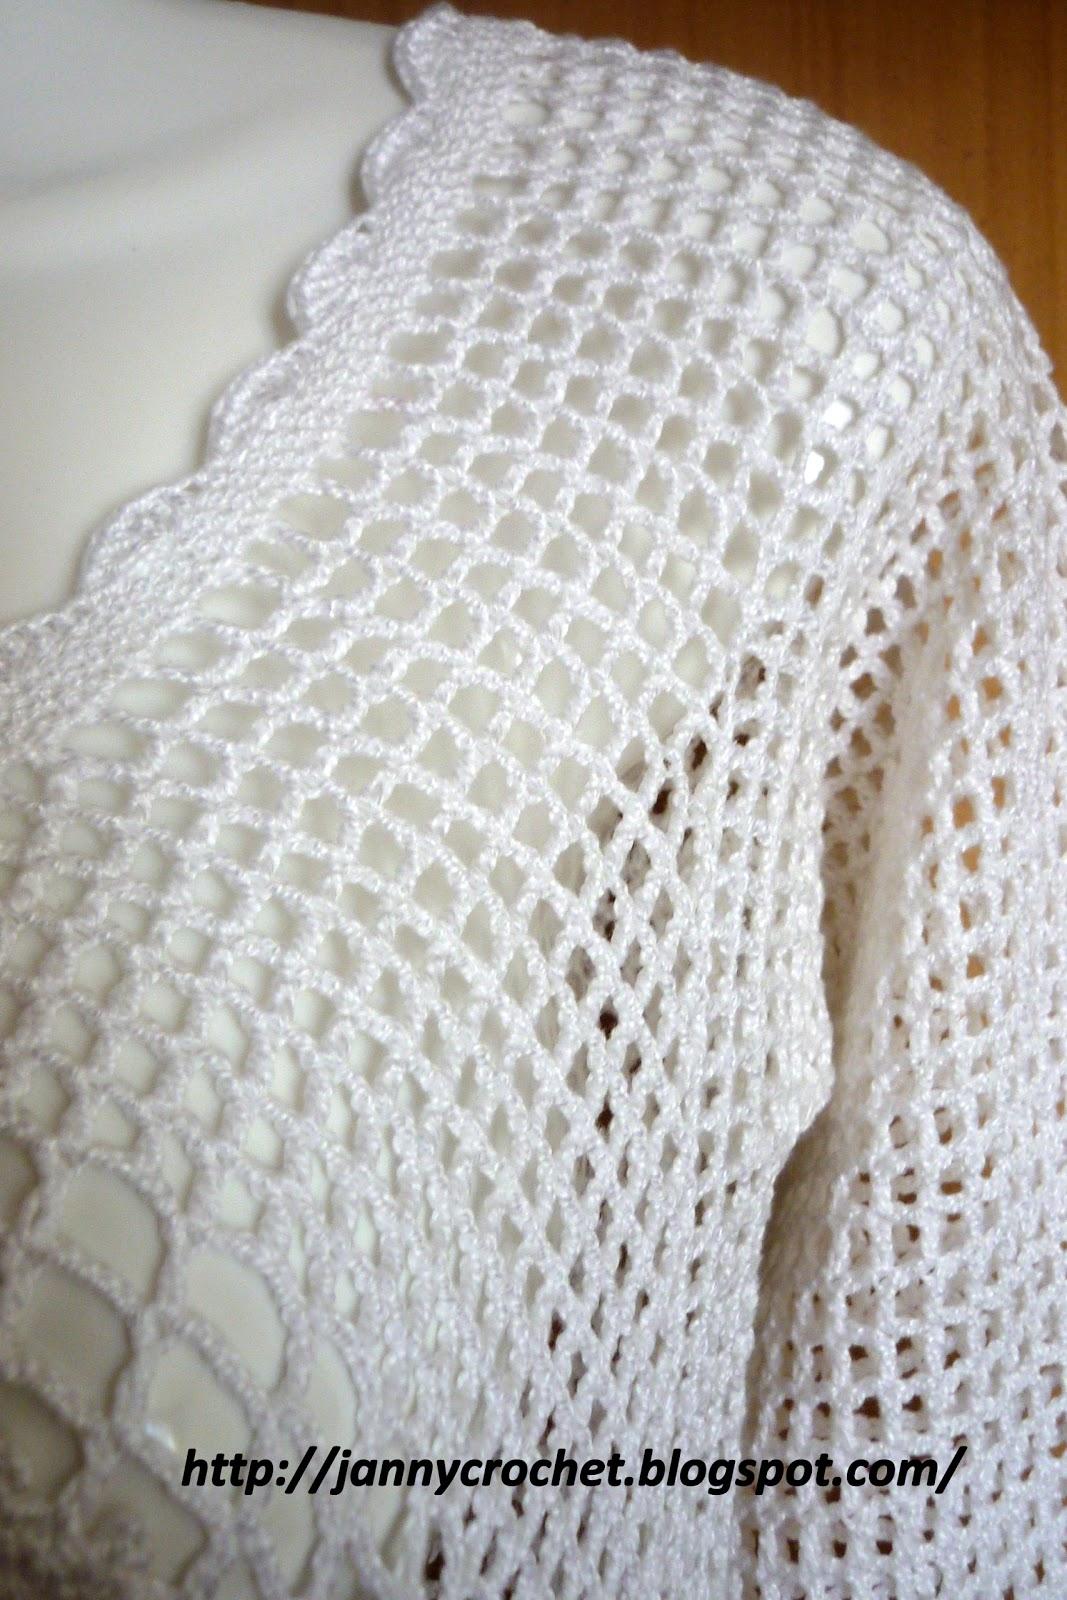 Janny crochet